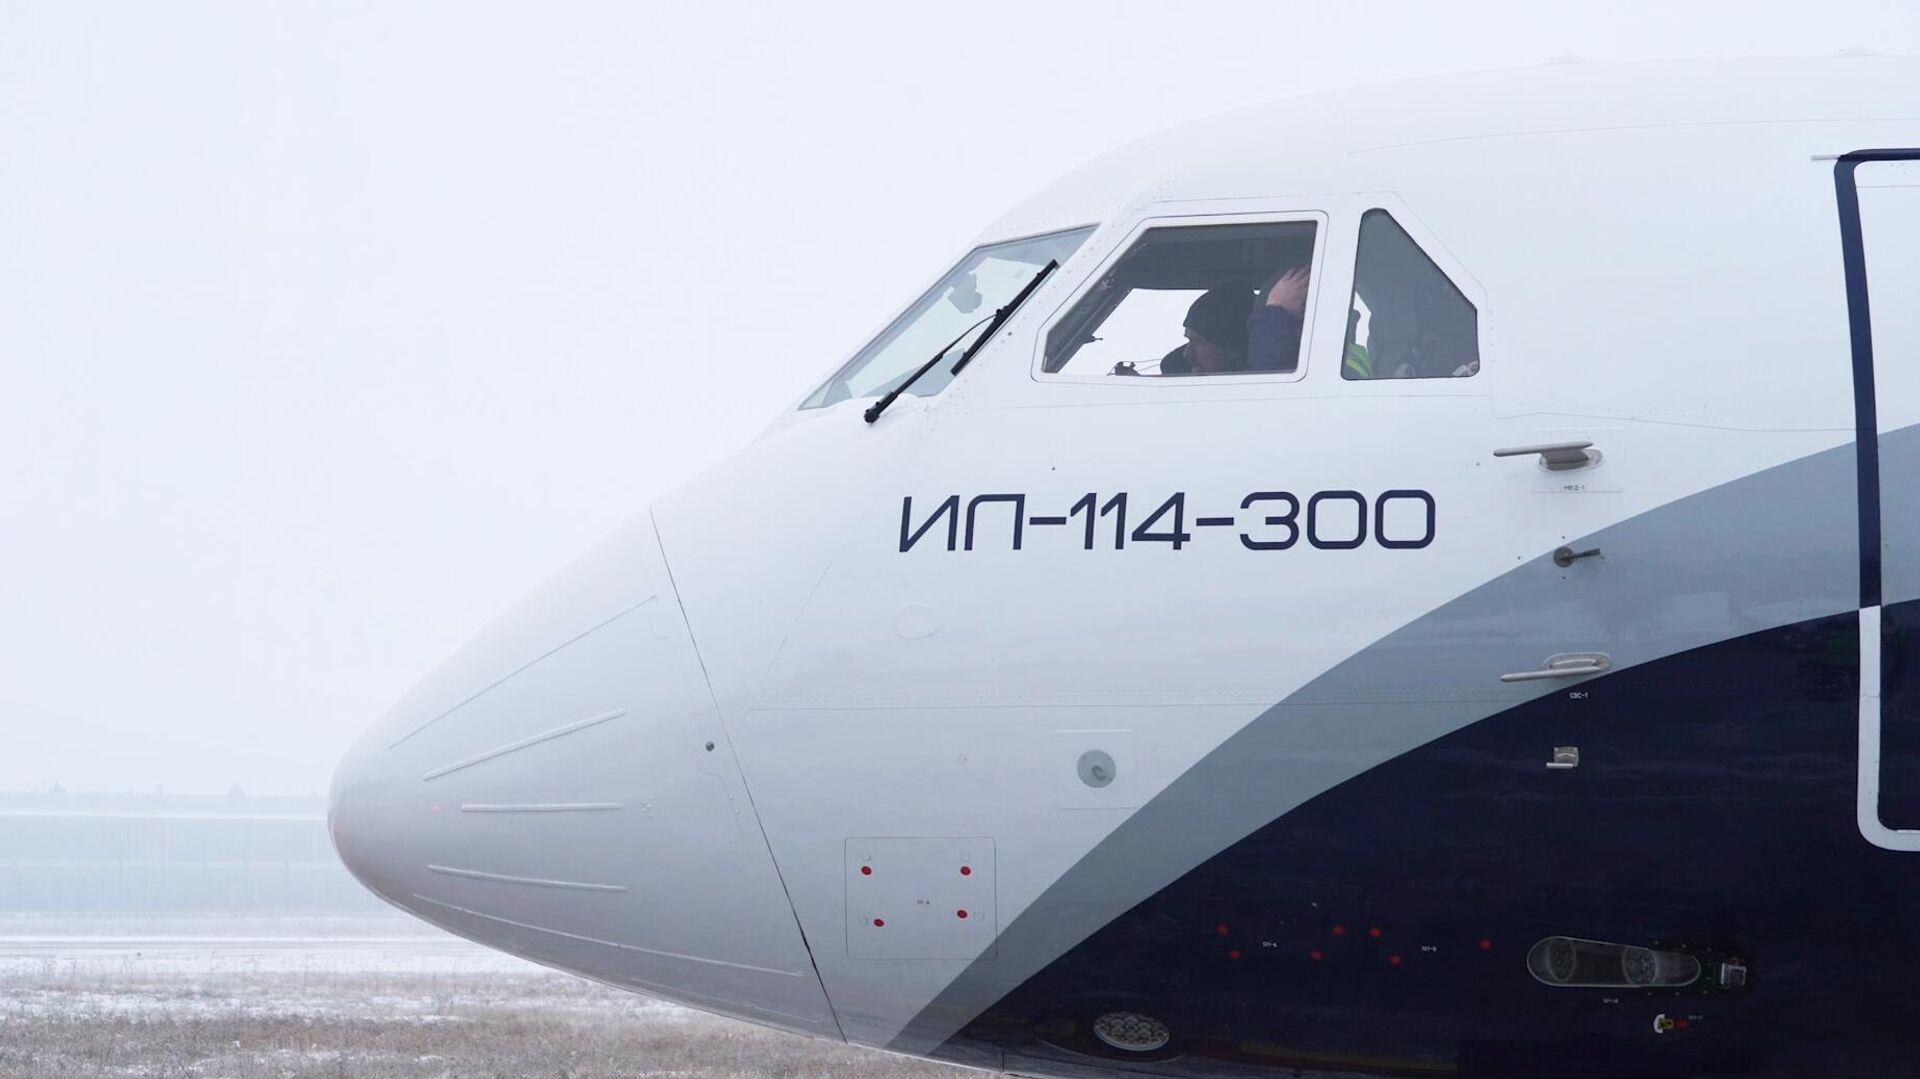 Avión Il-114-300 - Sputnik Mundo, 1920, 29.06.2021